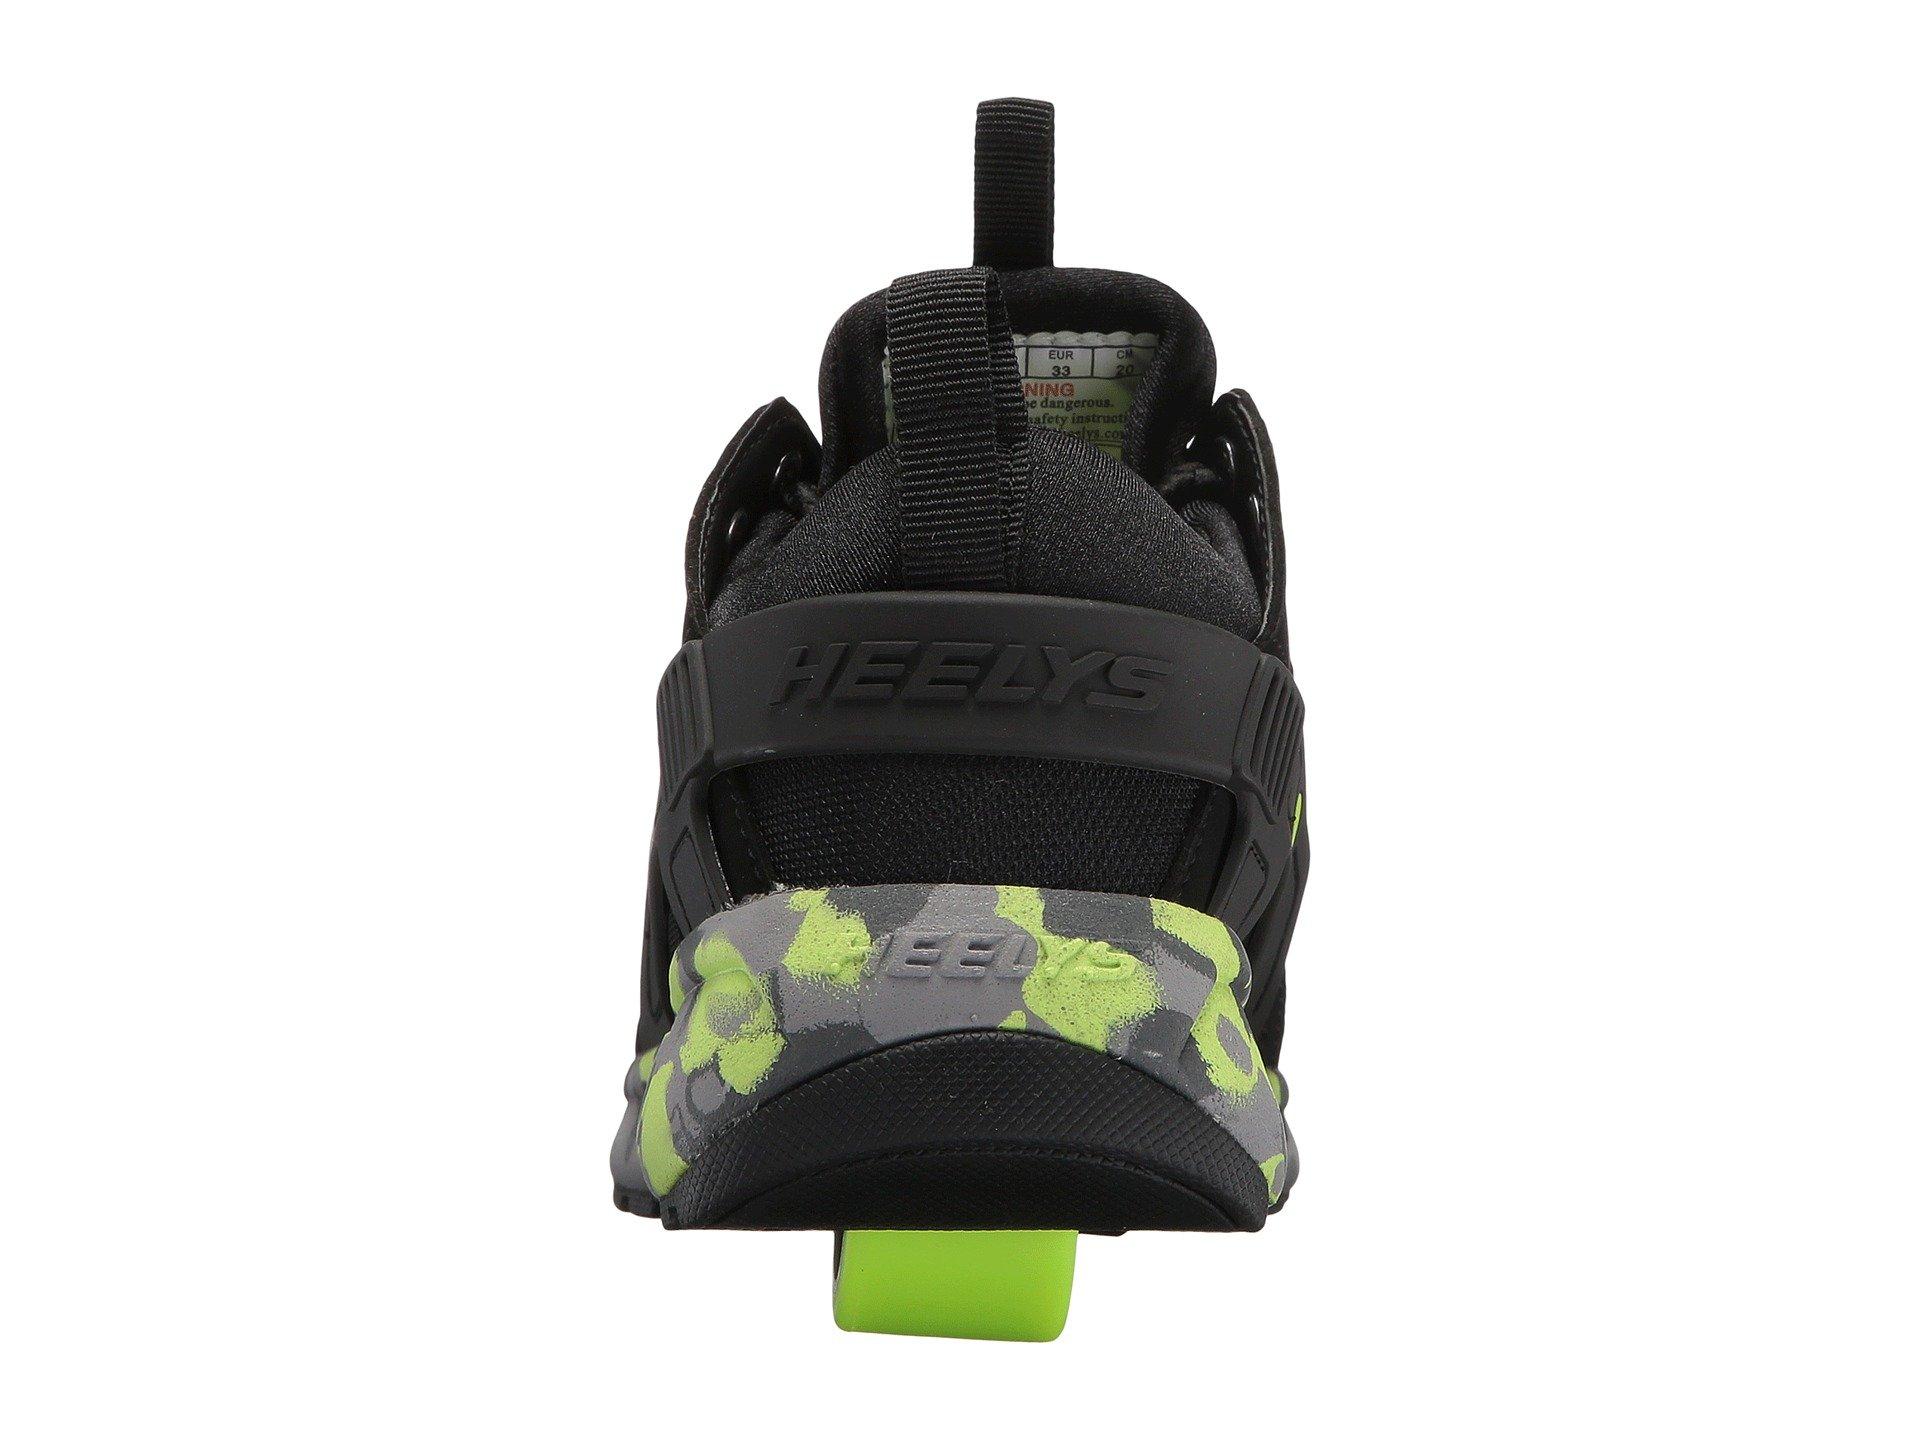 Heelys HE100095H Kid's Force Sneakers, Black/Brightyellow/Confet - 8 by Heelys (Image #3)